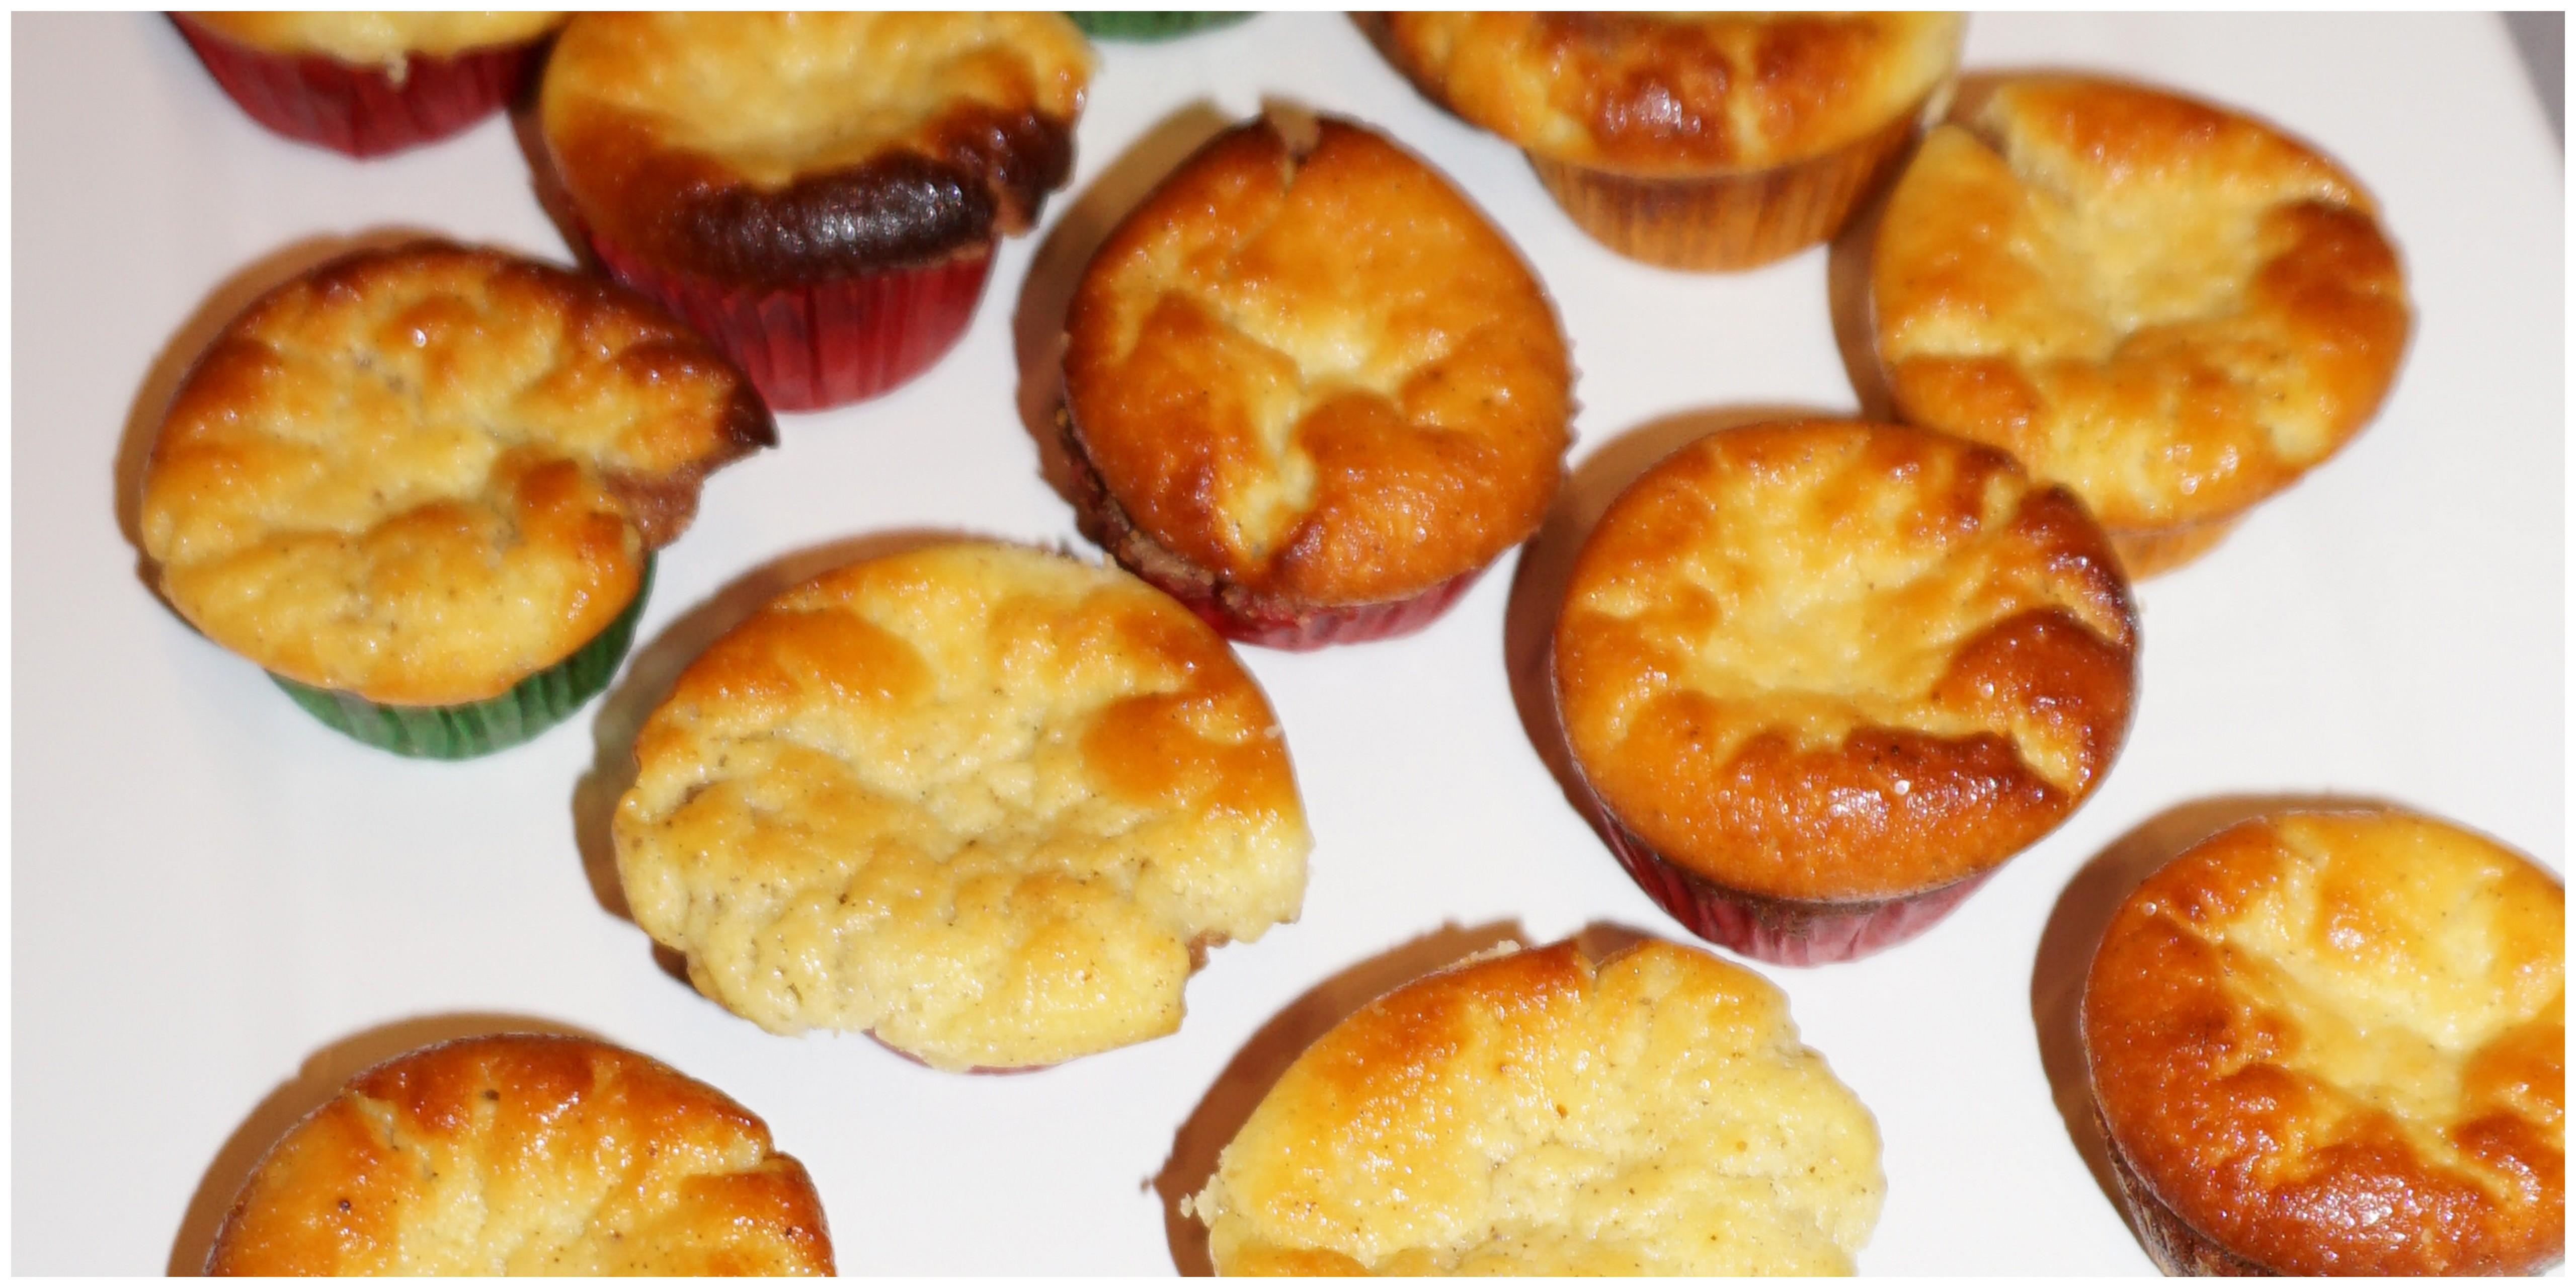 Zitronige Mini Kasekuchen Muffins Naschkatze